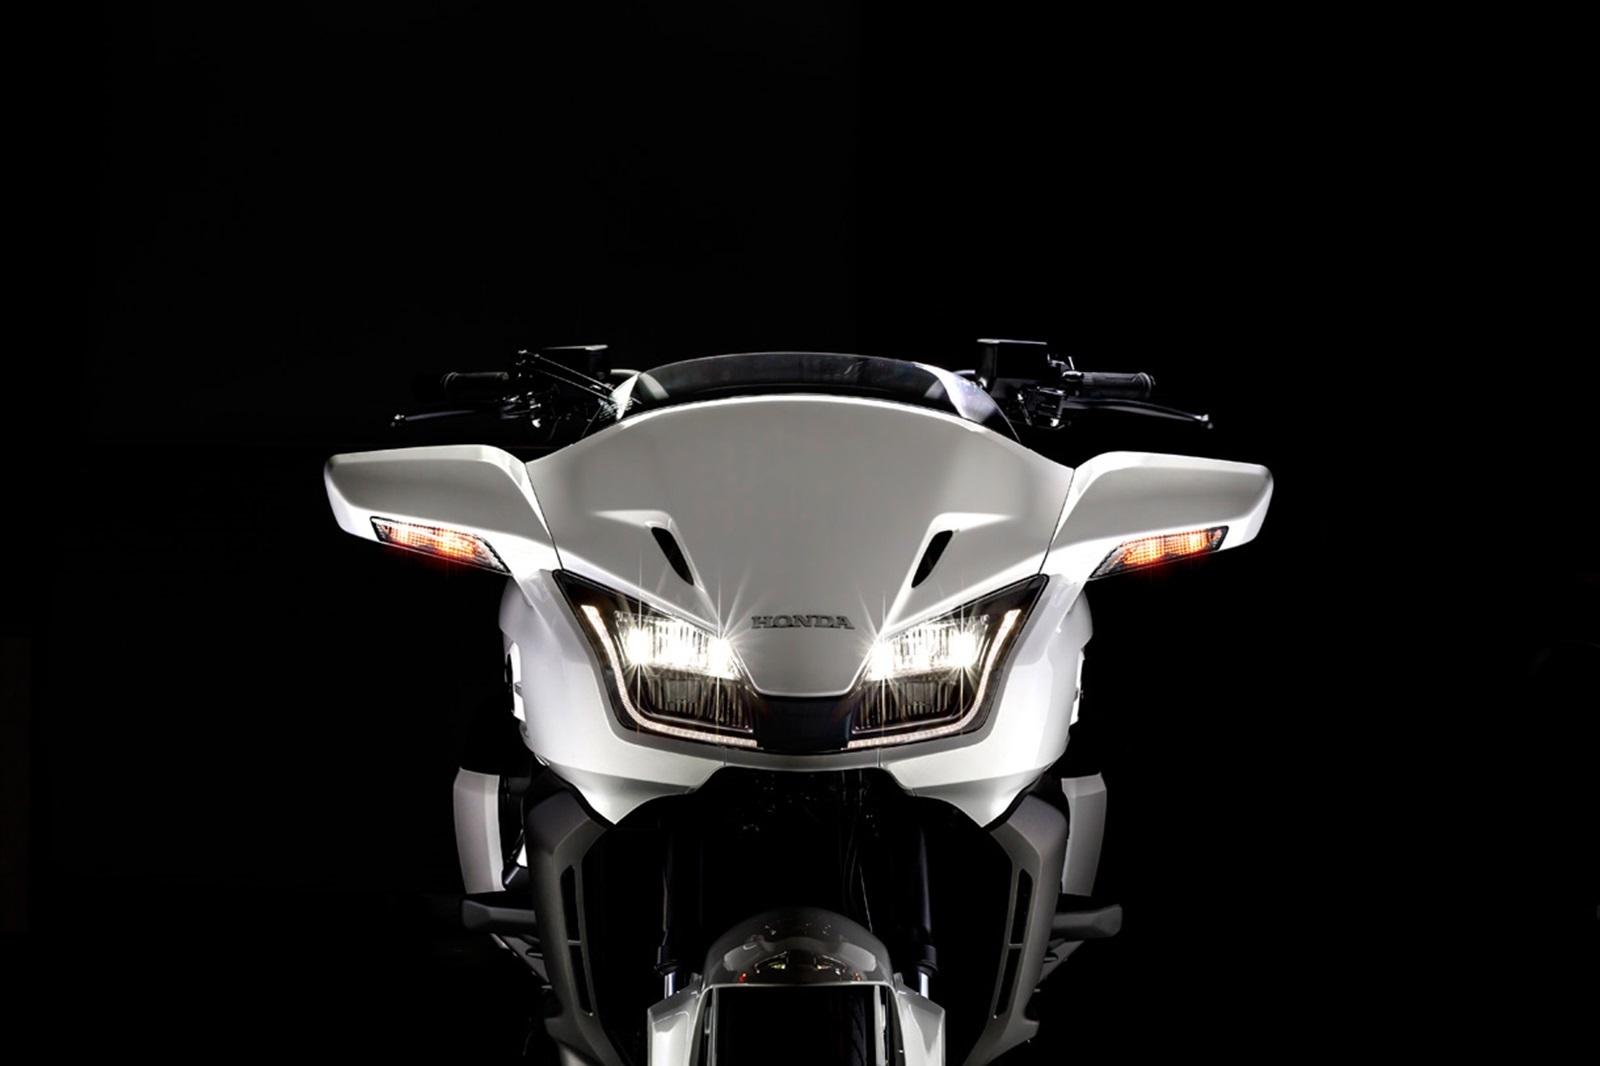 Foto de Honda VTX 1300 en detalle (20/20)